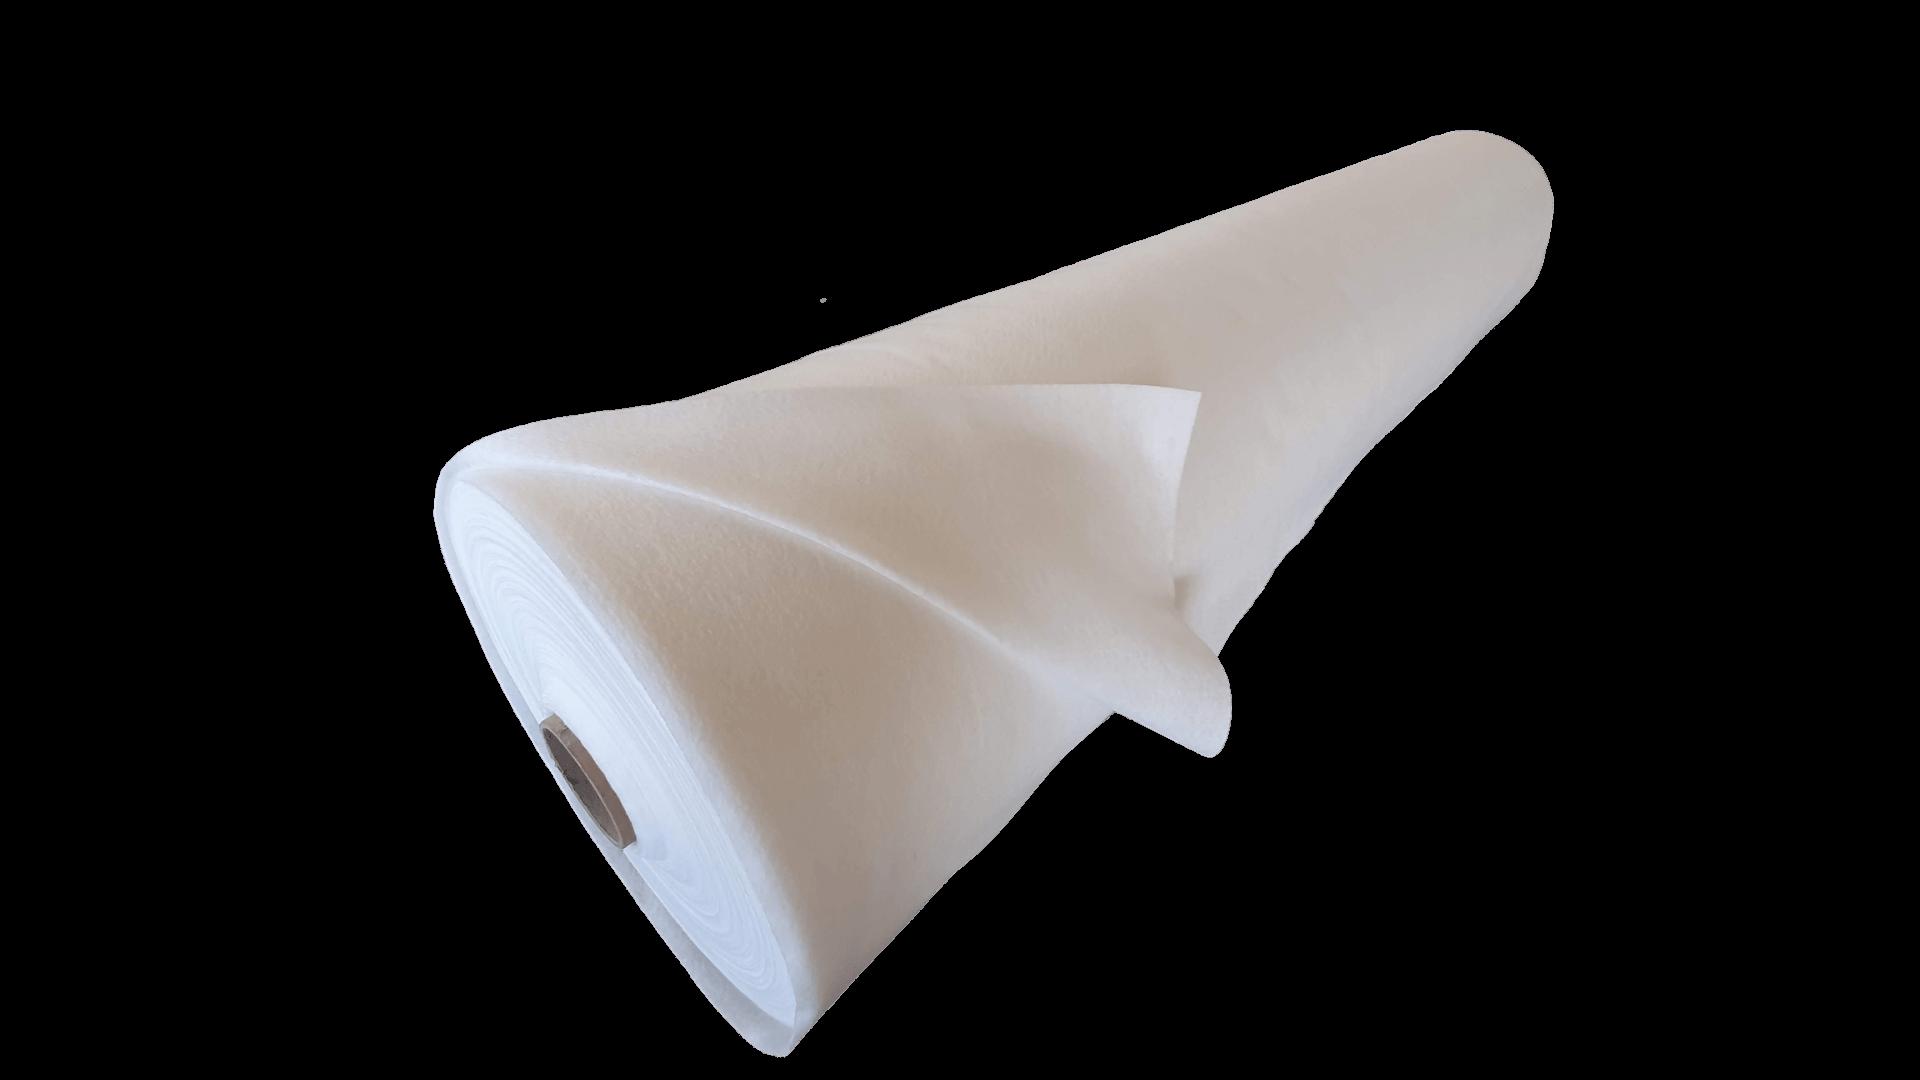 Protectiv hidrofob 110 - material netesut poliester hidrofobizat pentru articole medicale poza somnart.ro